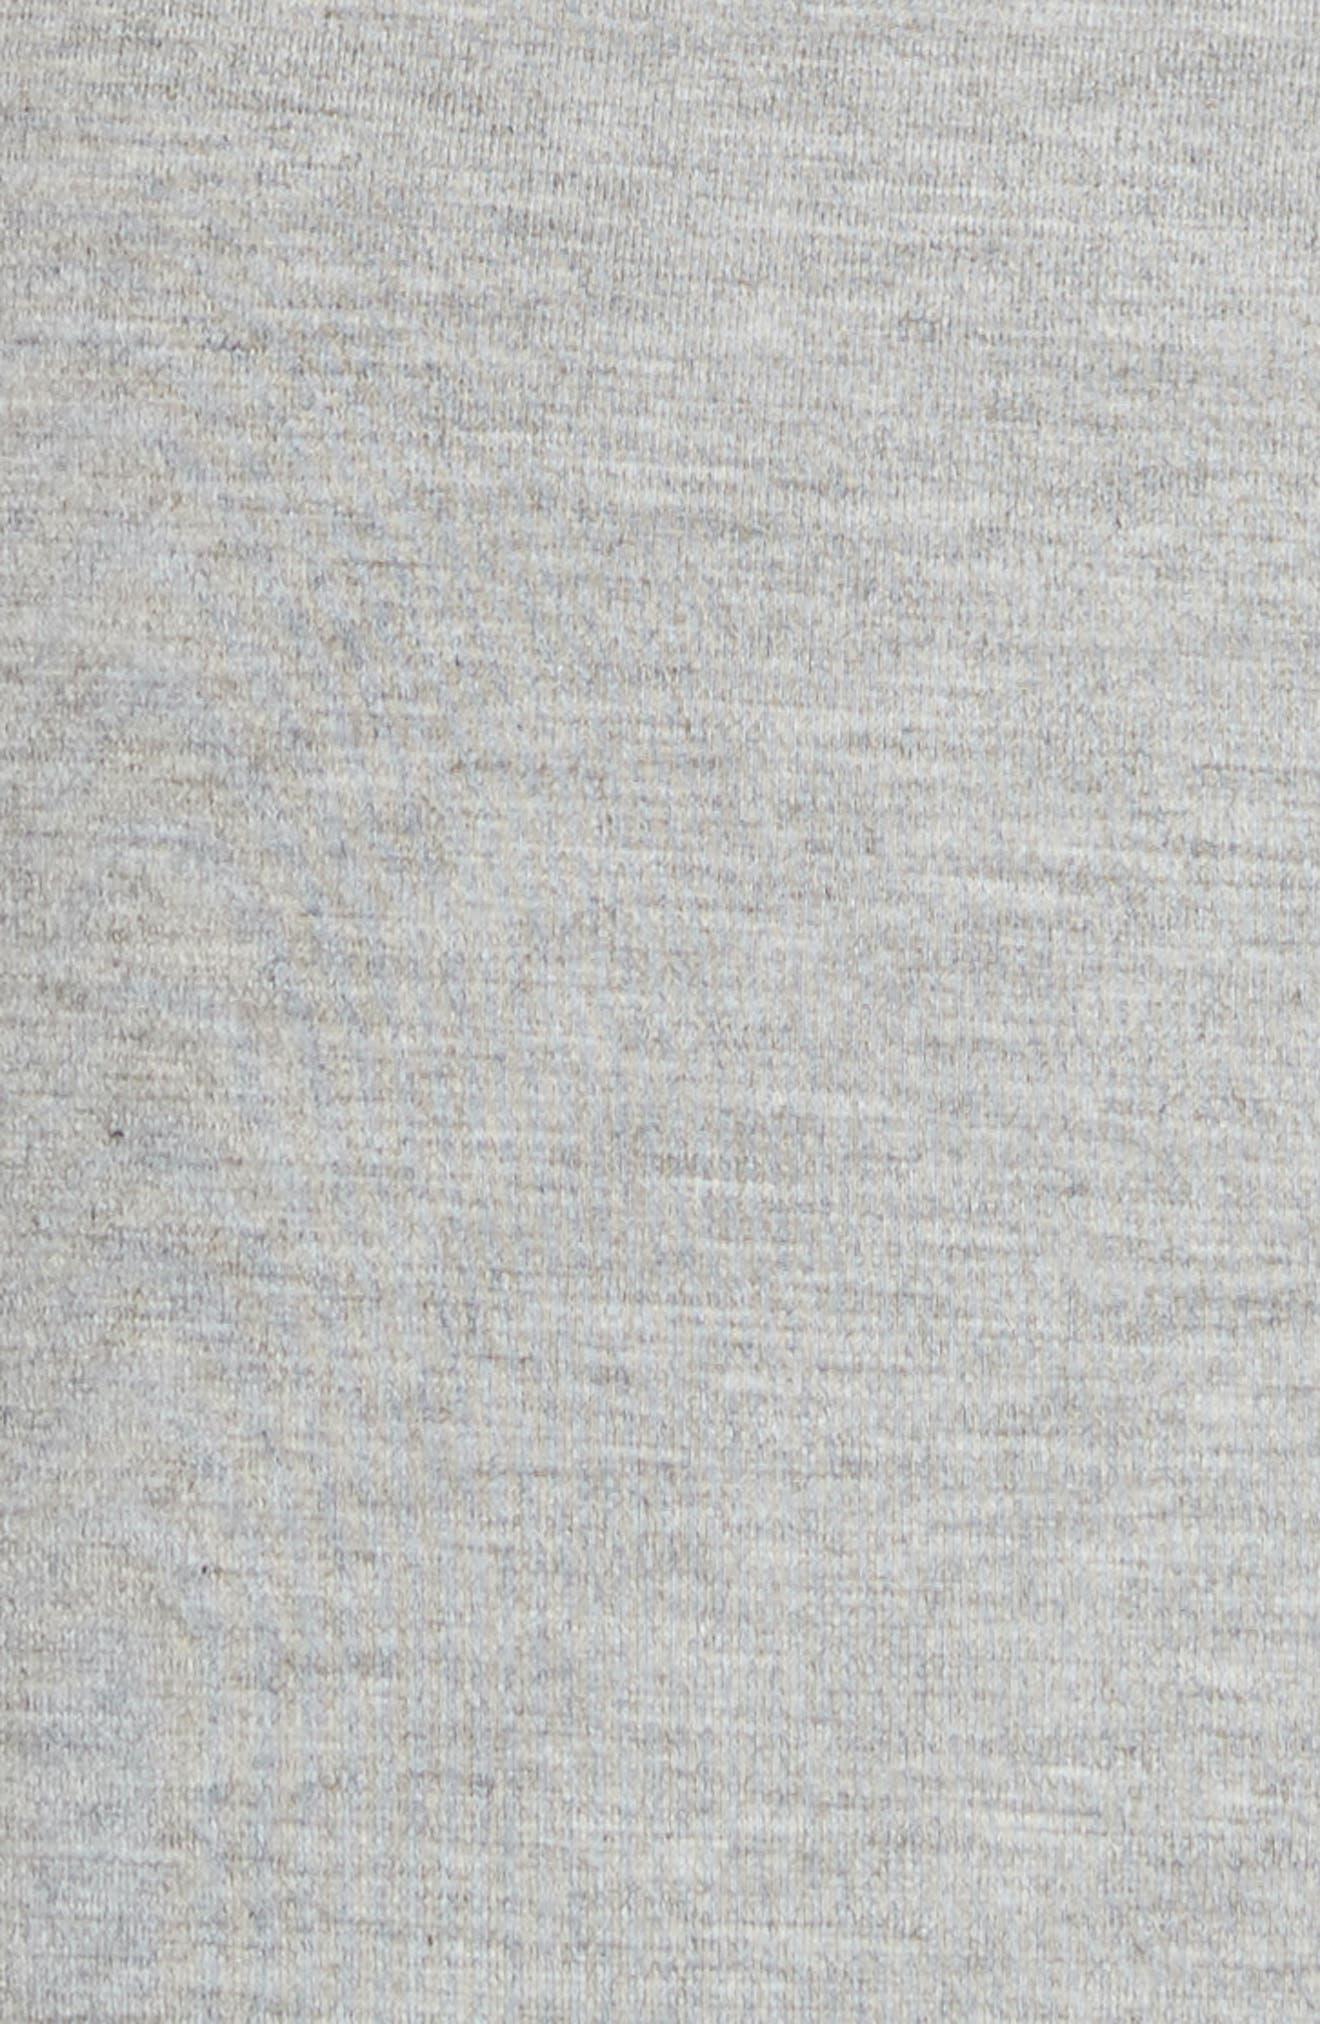 Evalina Tie Front Dress,                             Alternate thumbnail 5, color,                             031